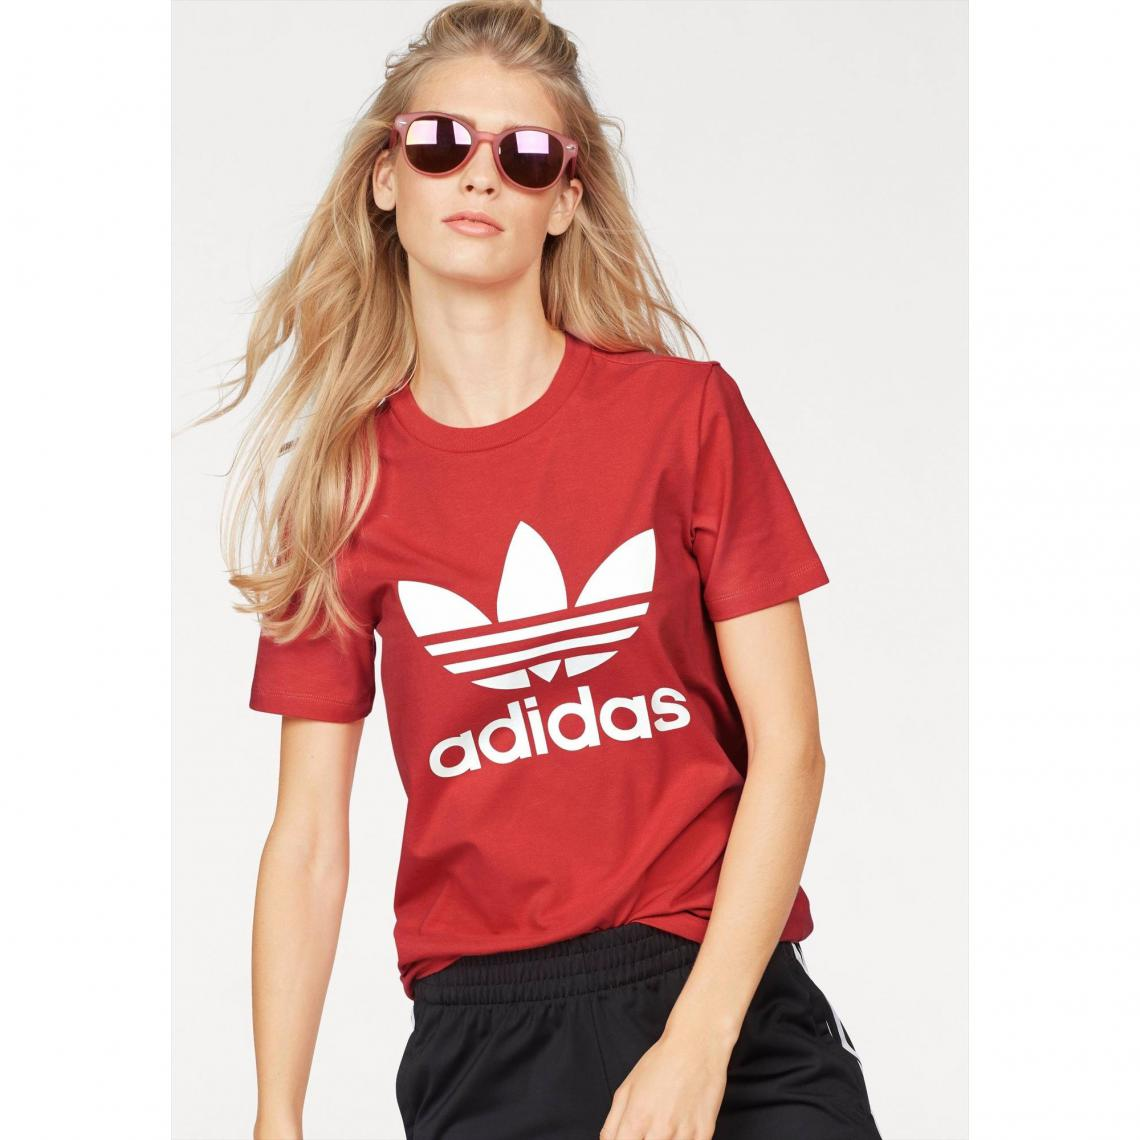 new arrivals 4cf38 28b74 Tee-shirt femme TREFOIL adidas Originals - Orange Adidas Originals Femme